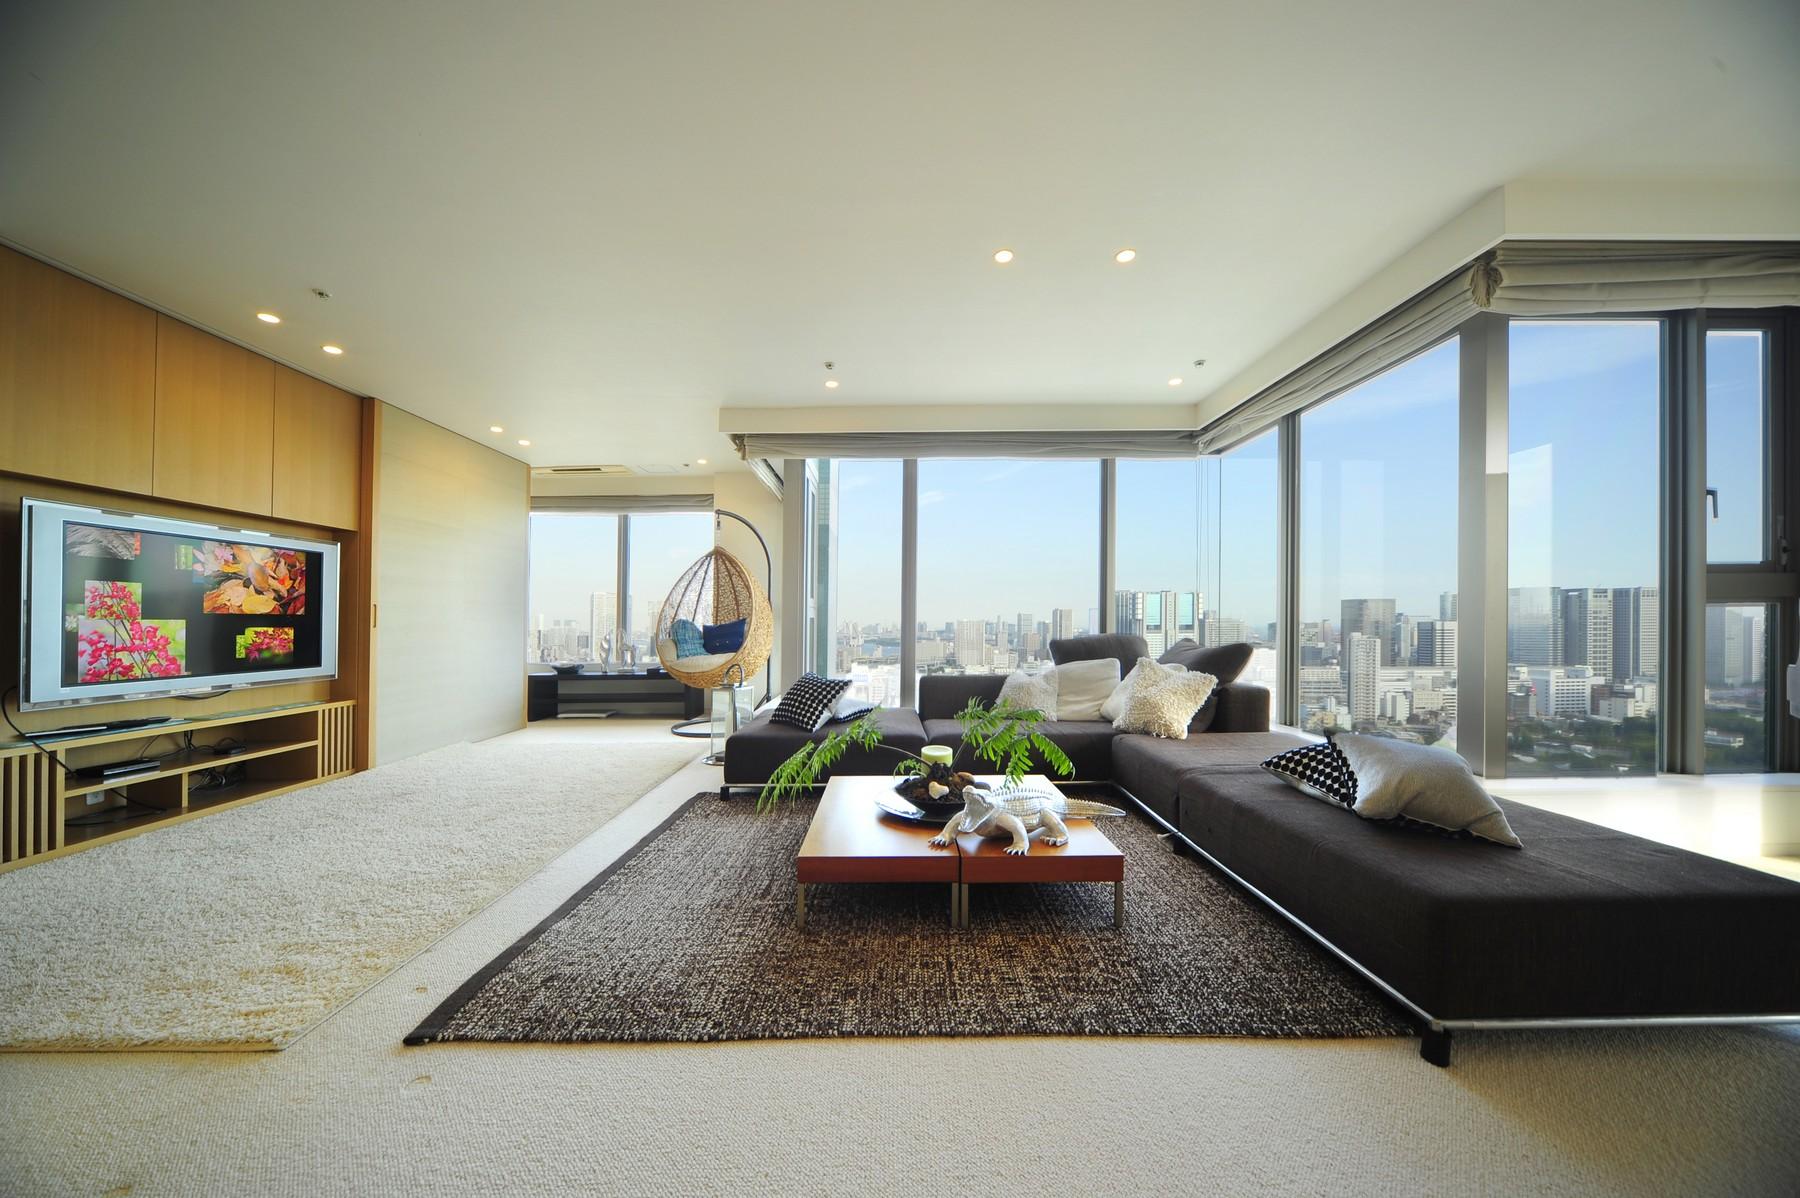 Apartment for Sale at City Tower Takanawa Takanawa, Minato-Ku, Tokyo Japan